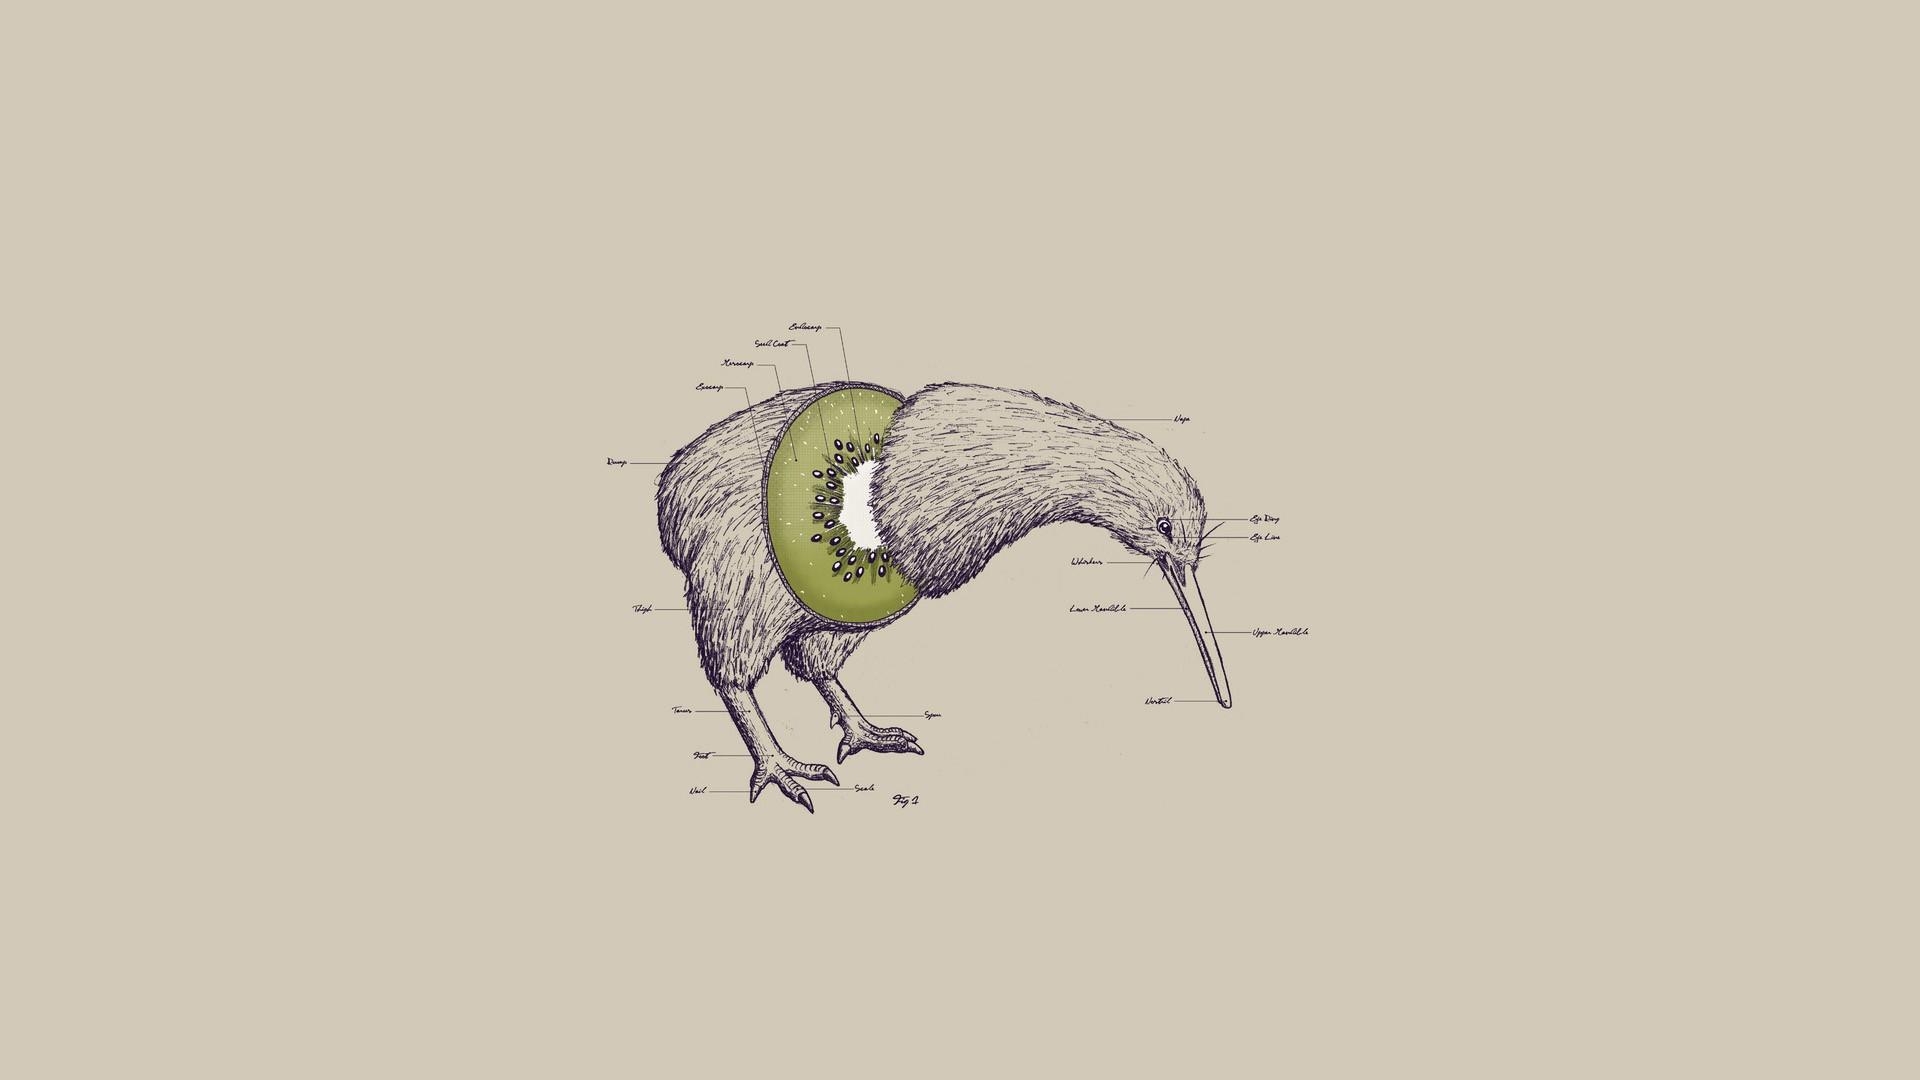 General 1920x1080 birds kiwi (animal) abstract animals kiwi (fruit) artwork surreal